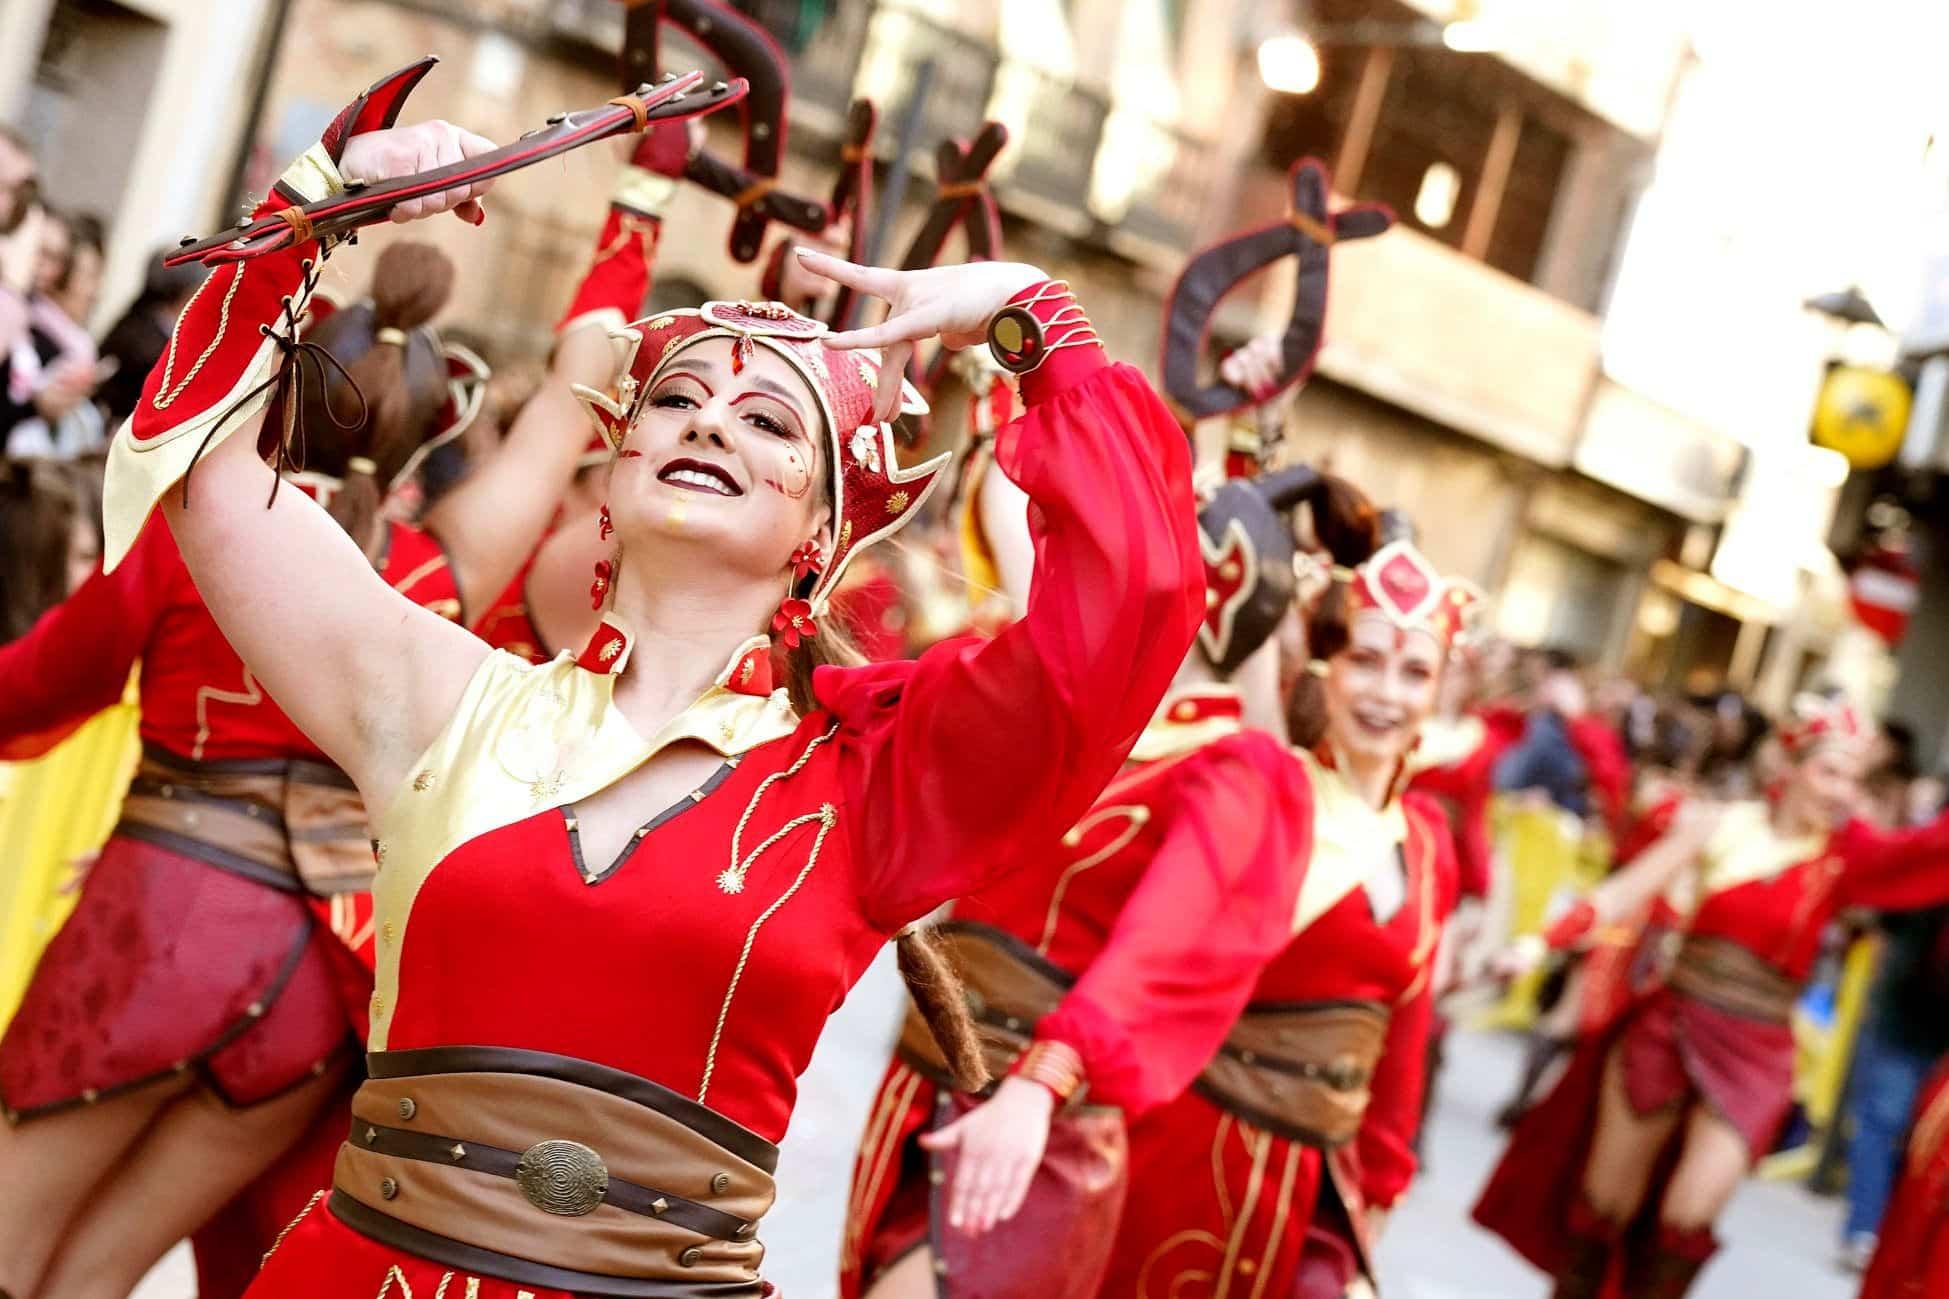 Carnaval de herencia 2020 ofertorio 100 - Selección de fotografías del Ofertorio del Carnaval de Herencia